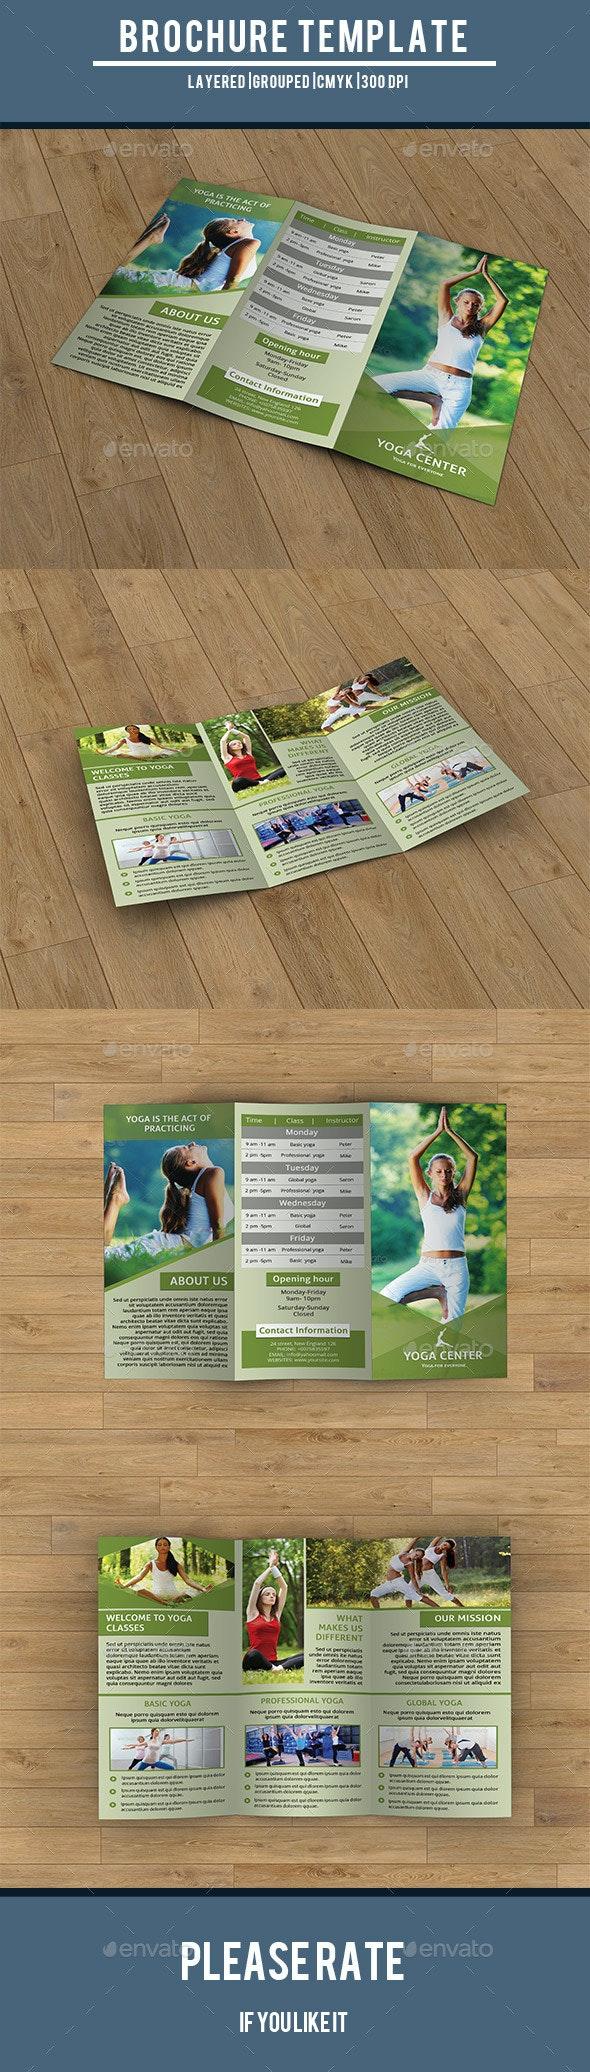 Trifold Brochure for Yoga Training Center-V203 - Corporate Brochures